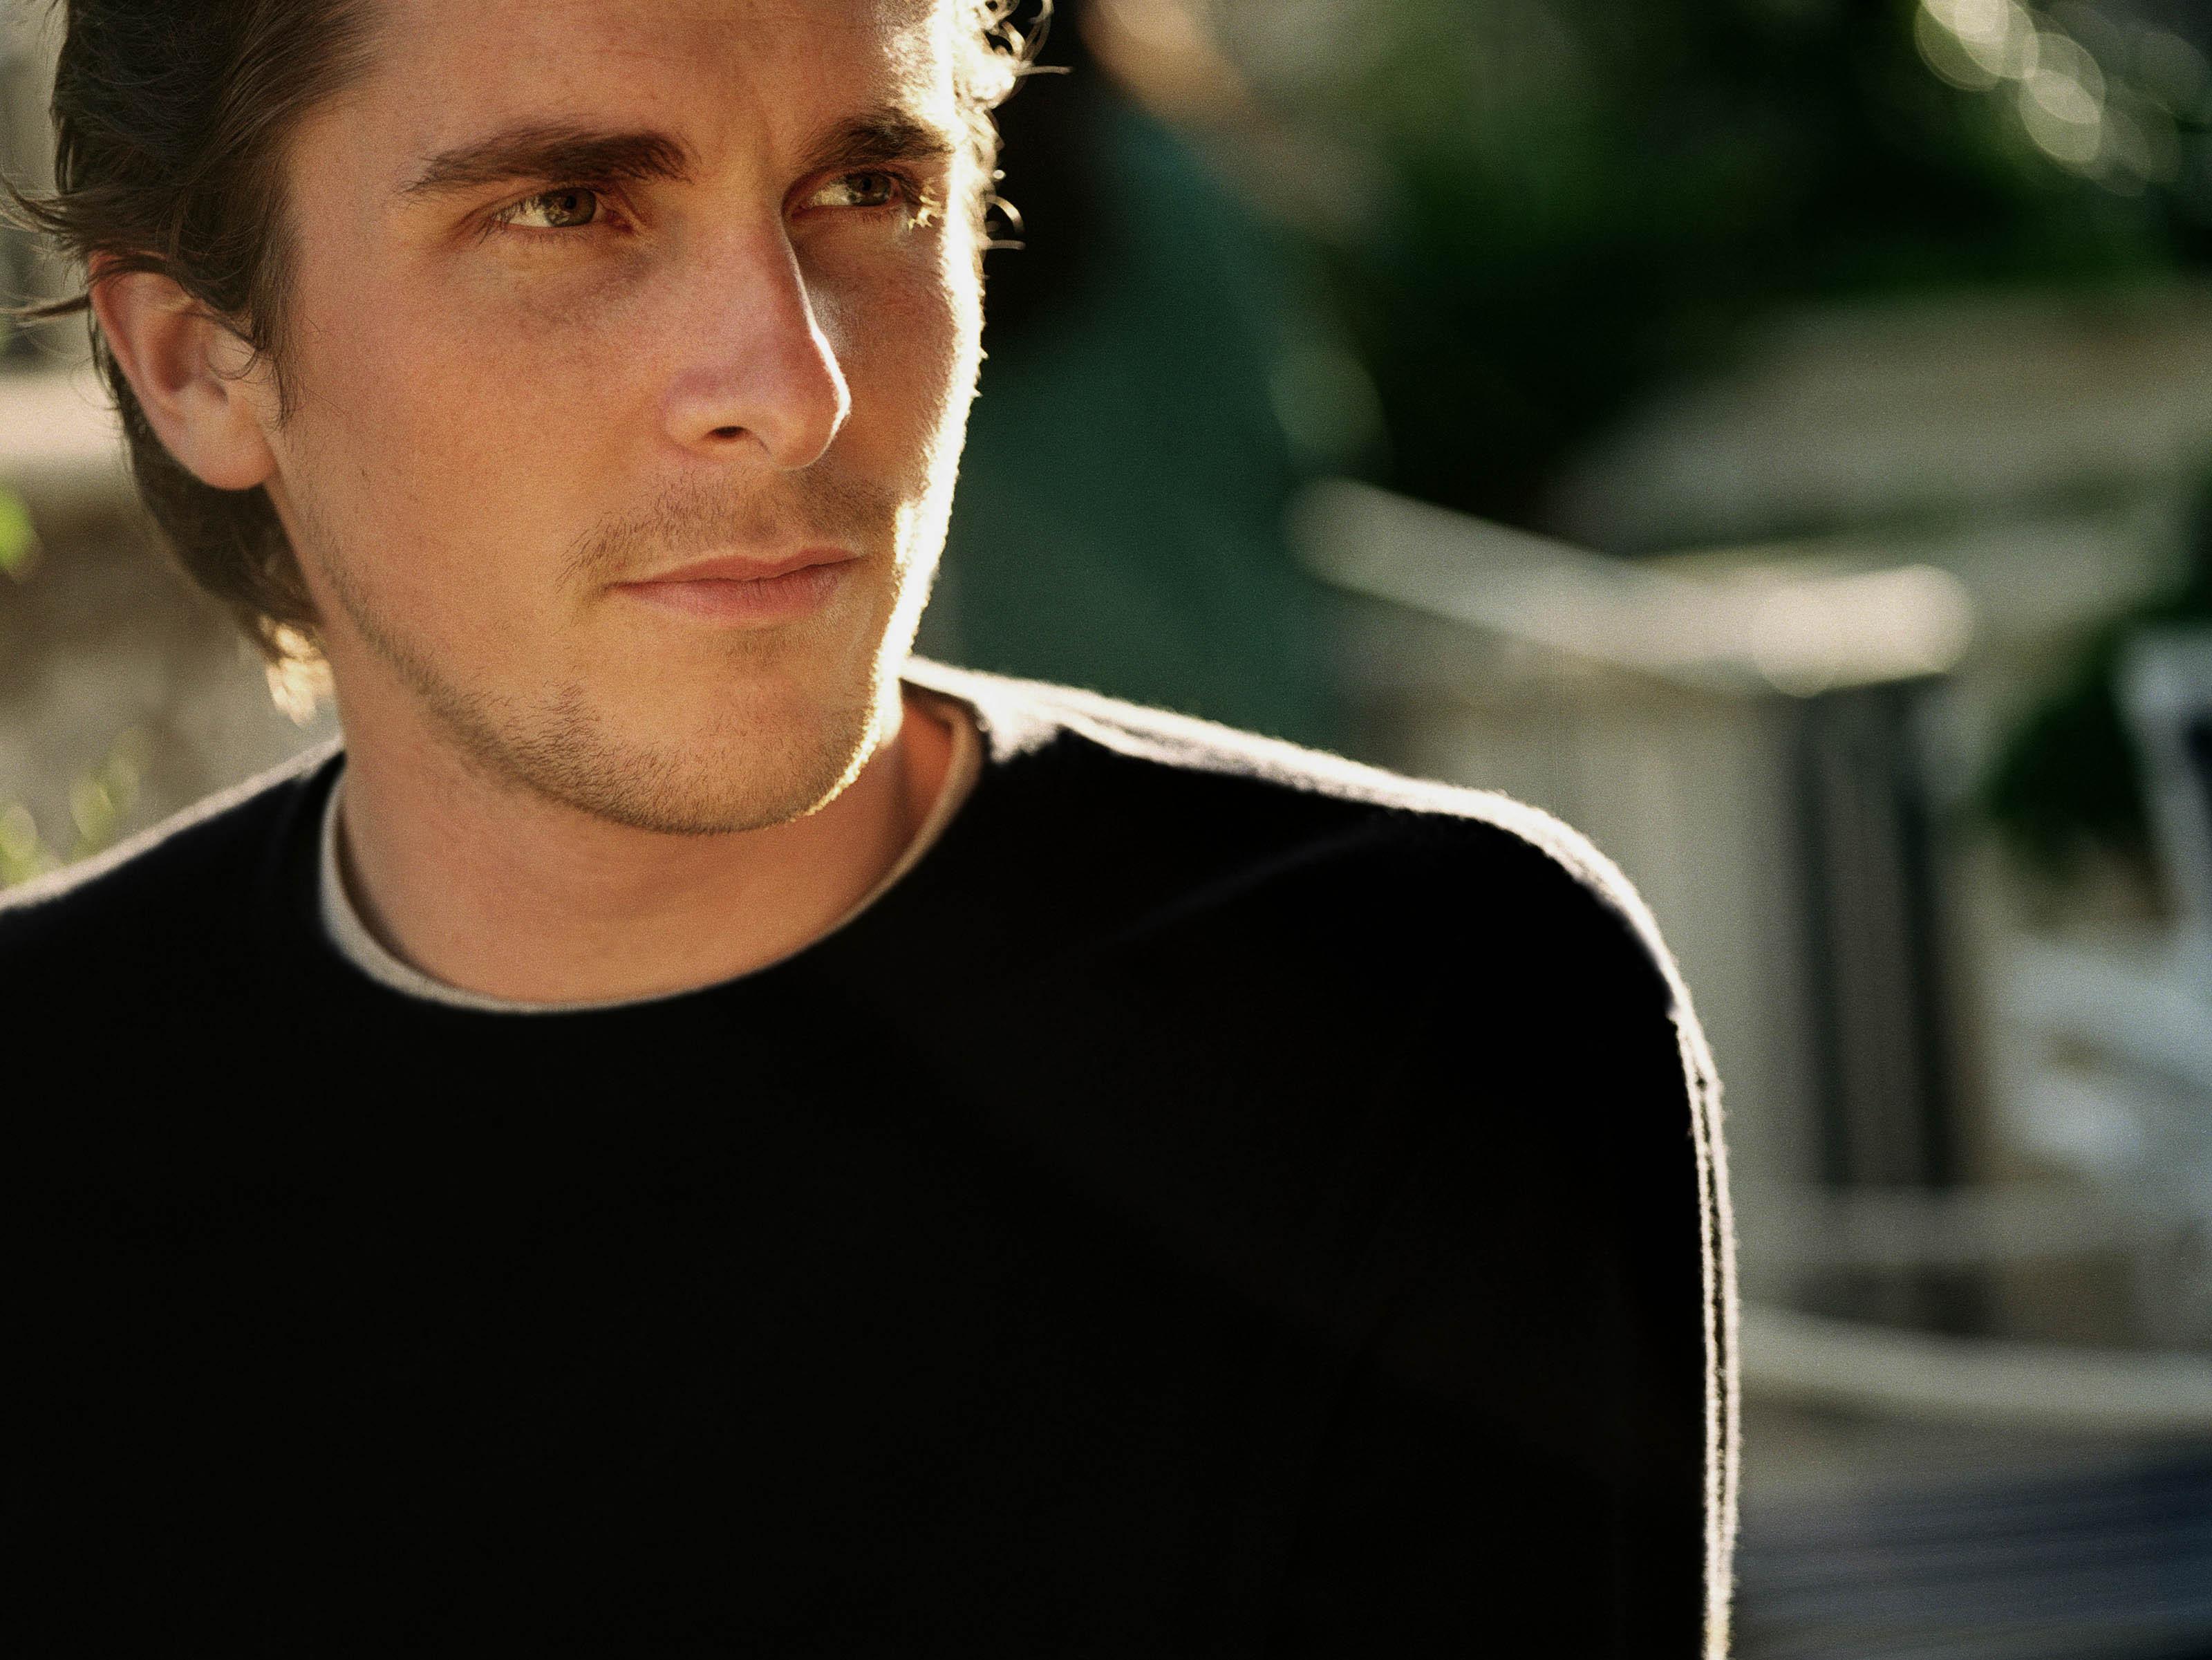 Christian Bale: Christian Bale Photo Gallery• PoPoPics.com